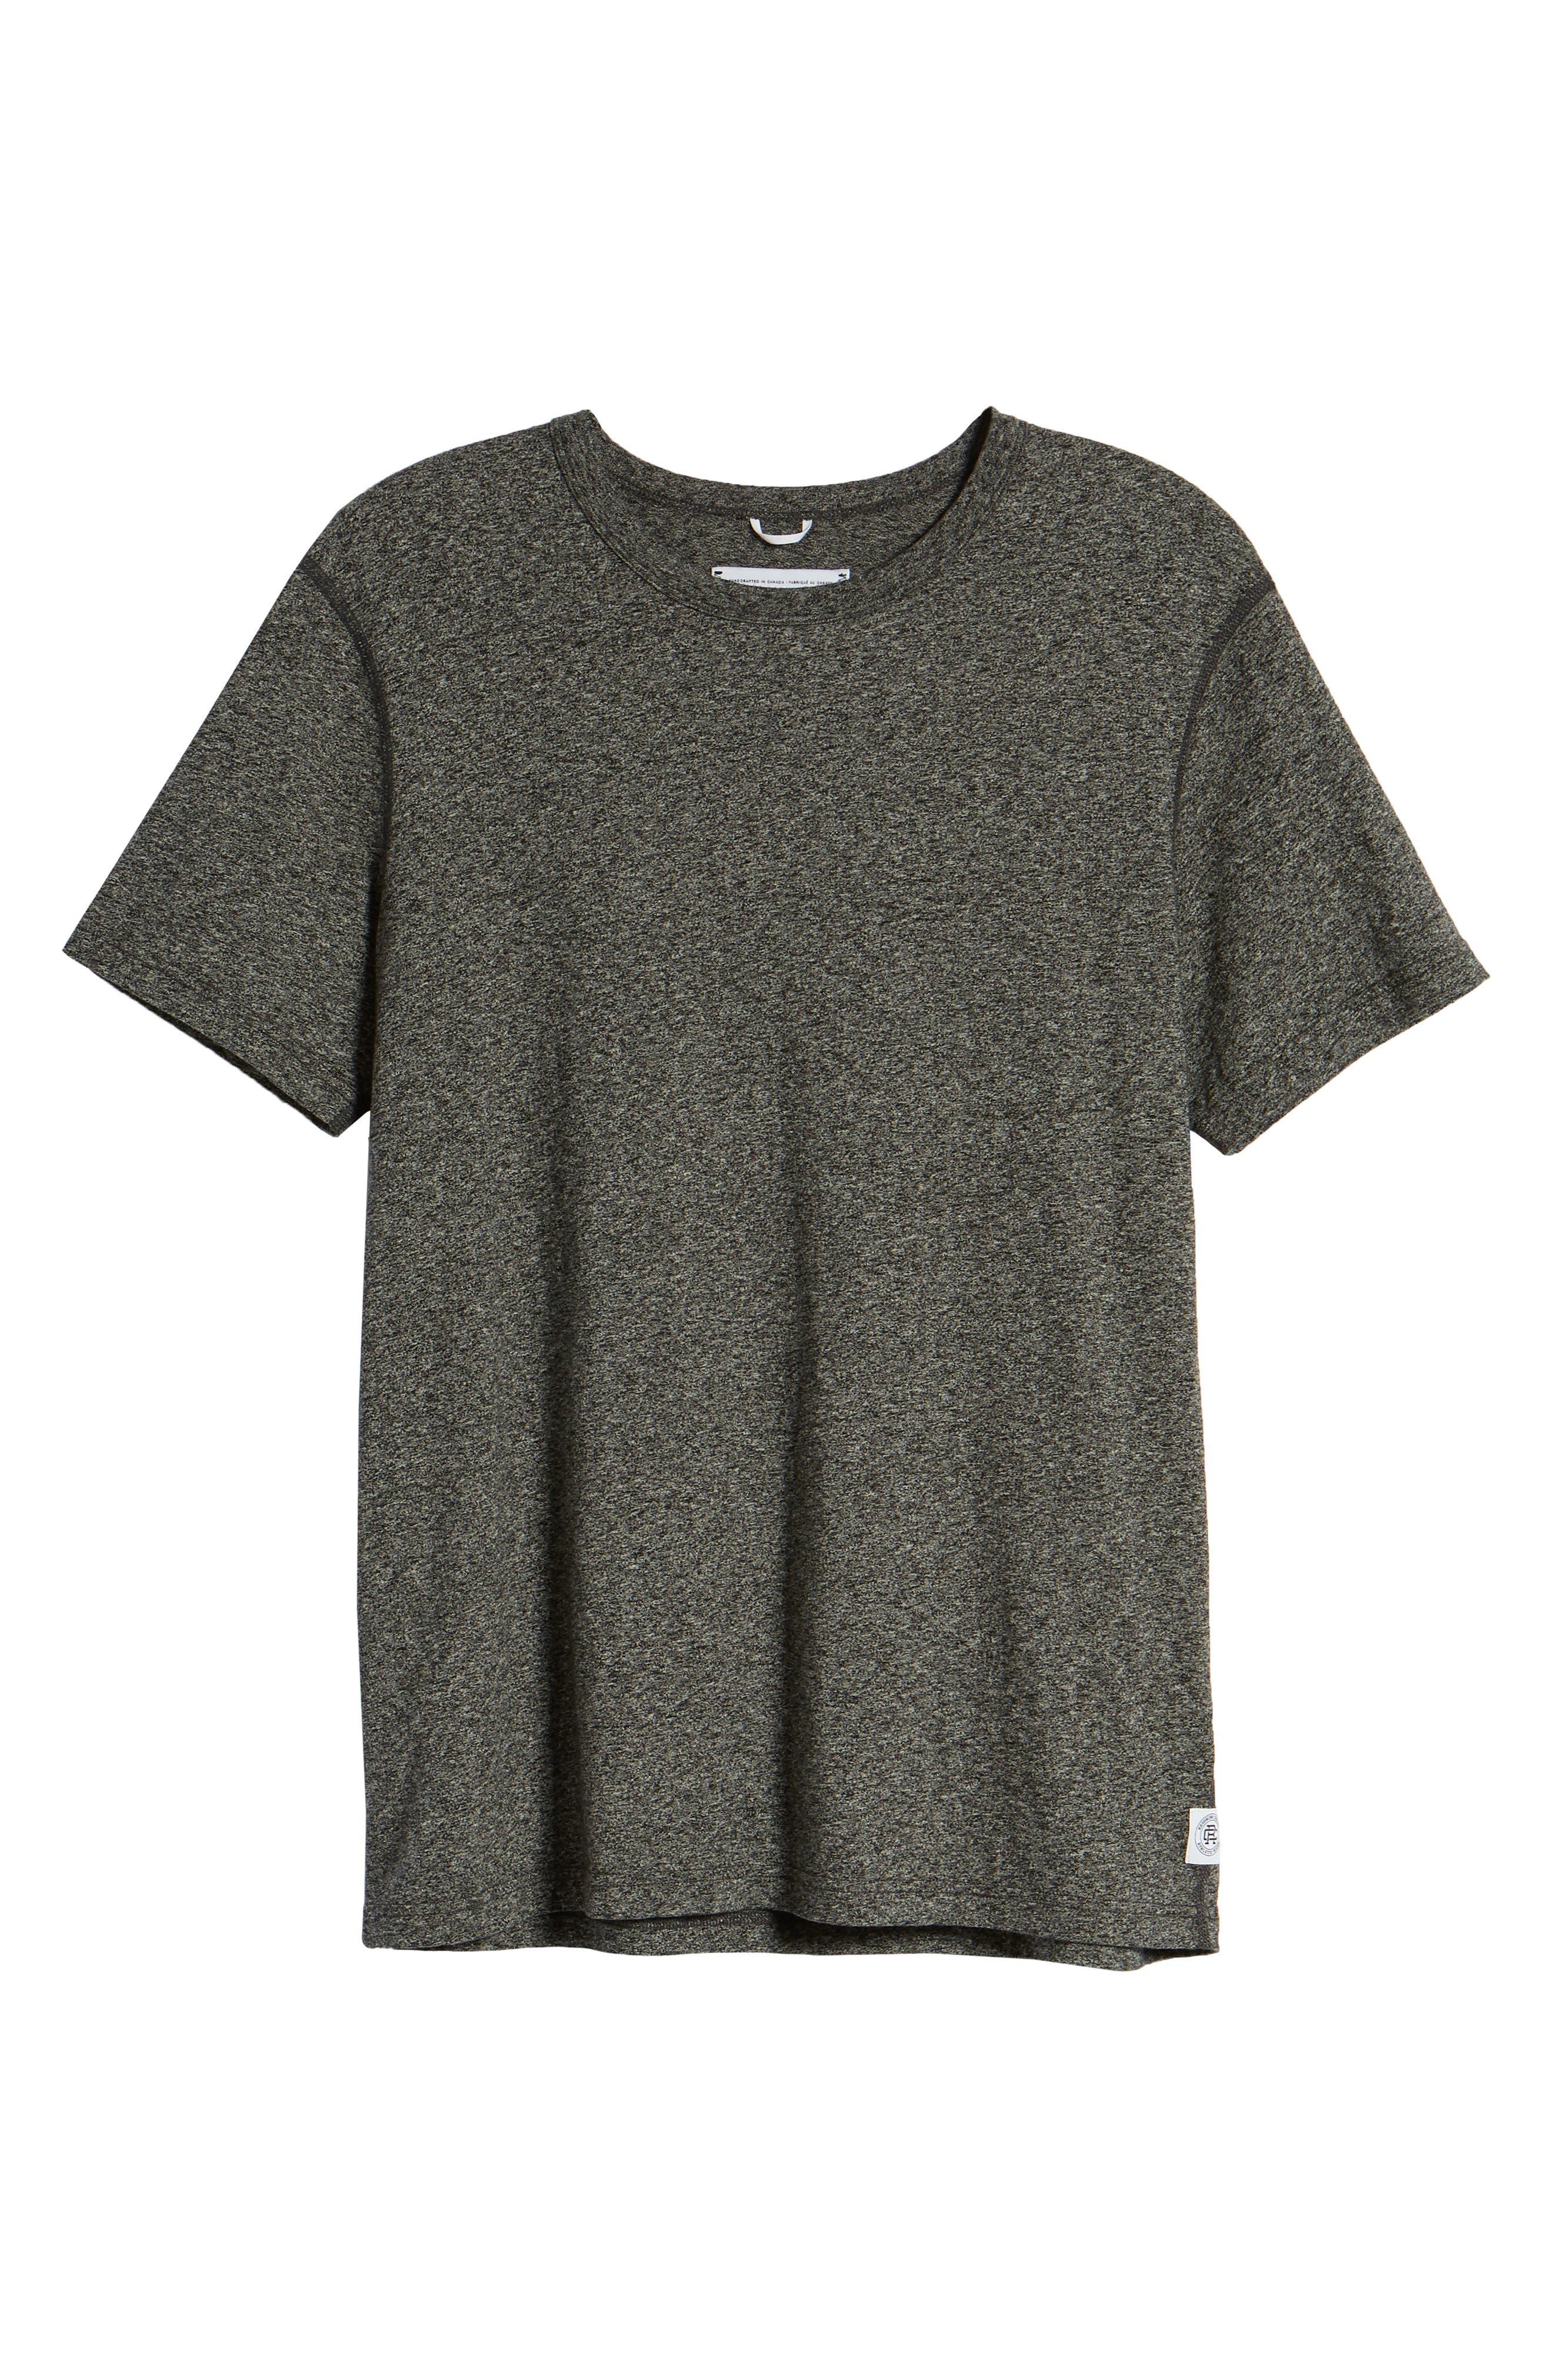 REIGNING CHAMP,                             Short Sleeve Crewneck T-Shirt,                             Alternate thumbnail 6, color,                             MEDIUM BLACK